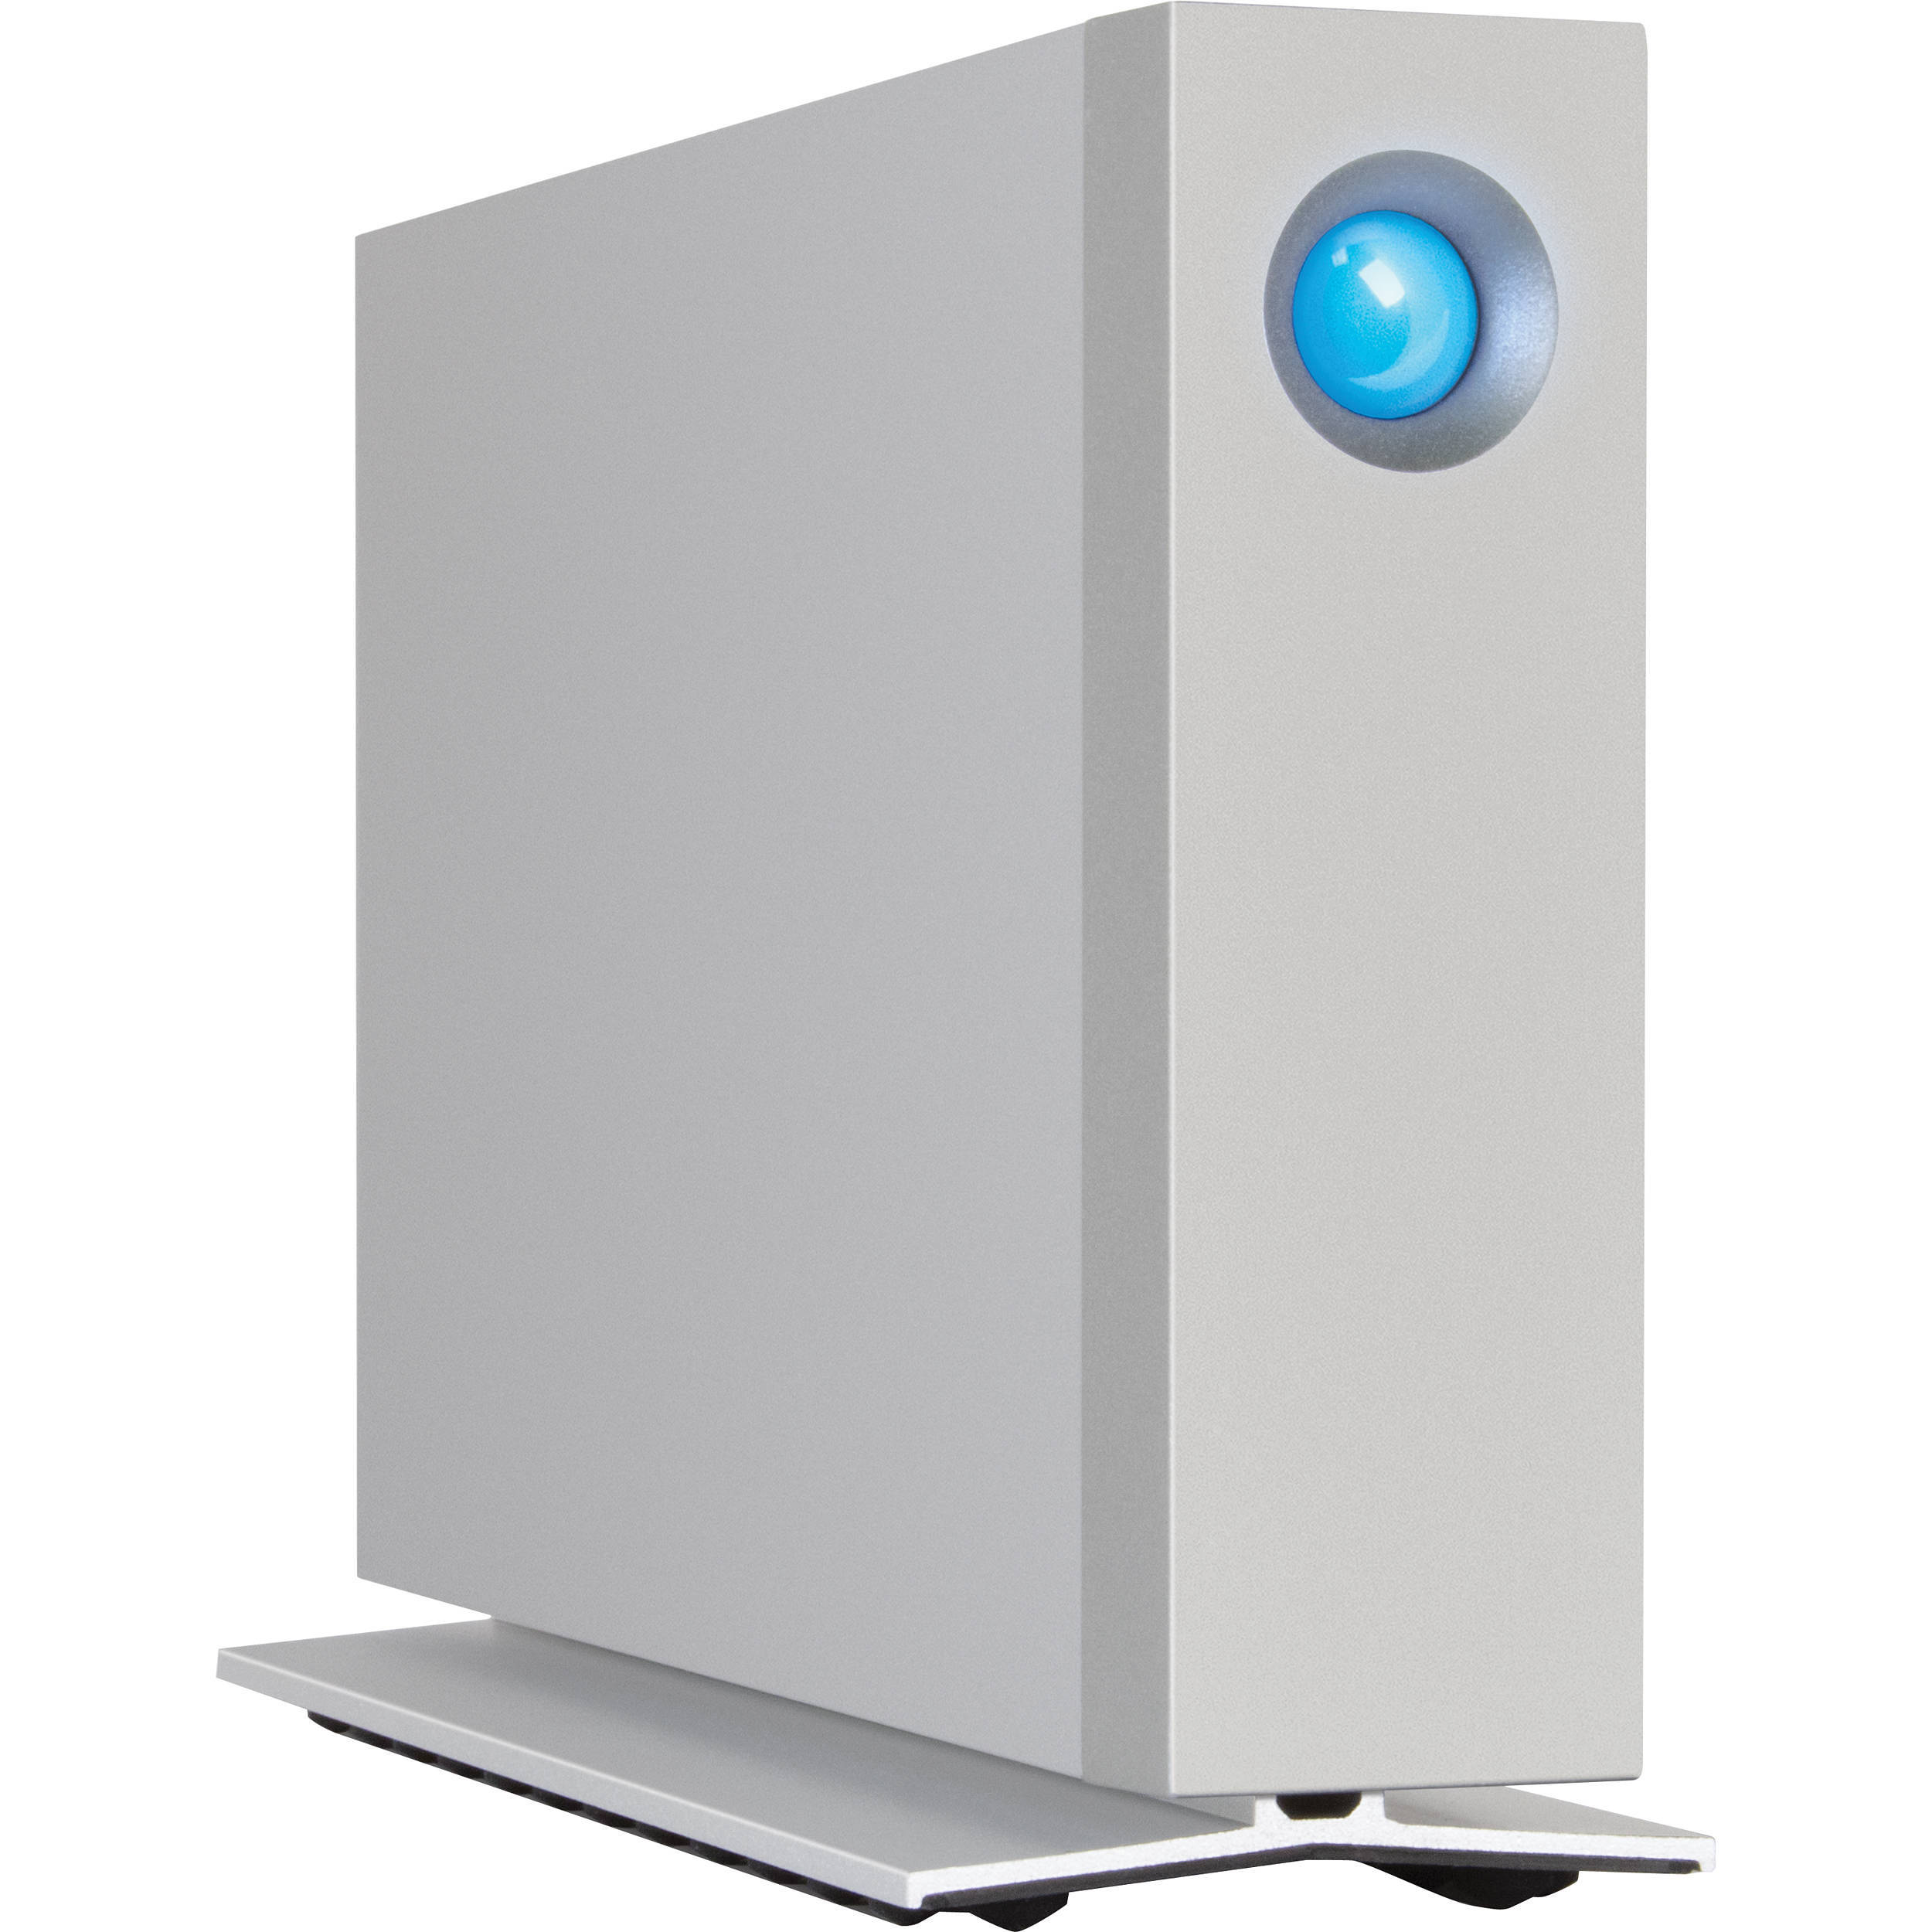 Lacie 3tb d2 thunderbolt 2 desktop hard drive stex3000100 b h for 3tb esterno